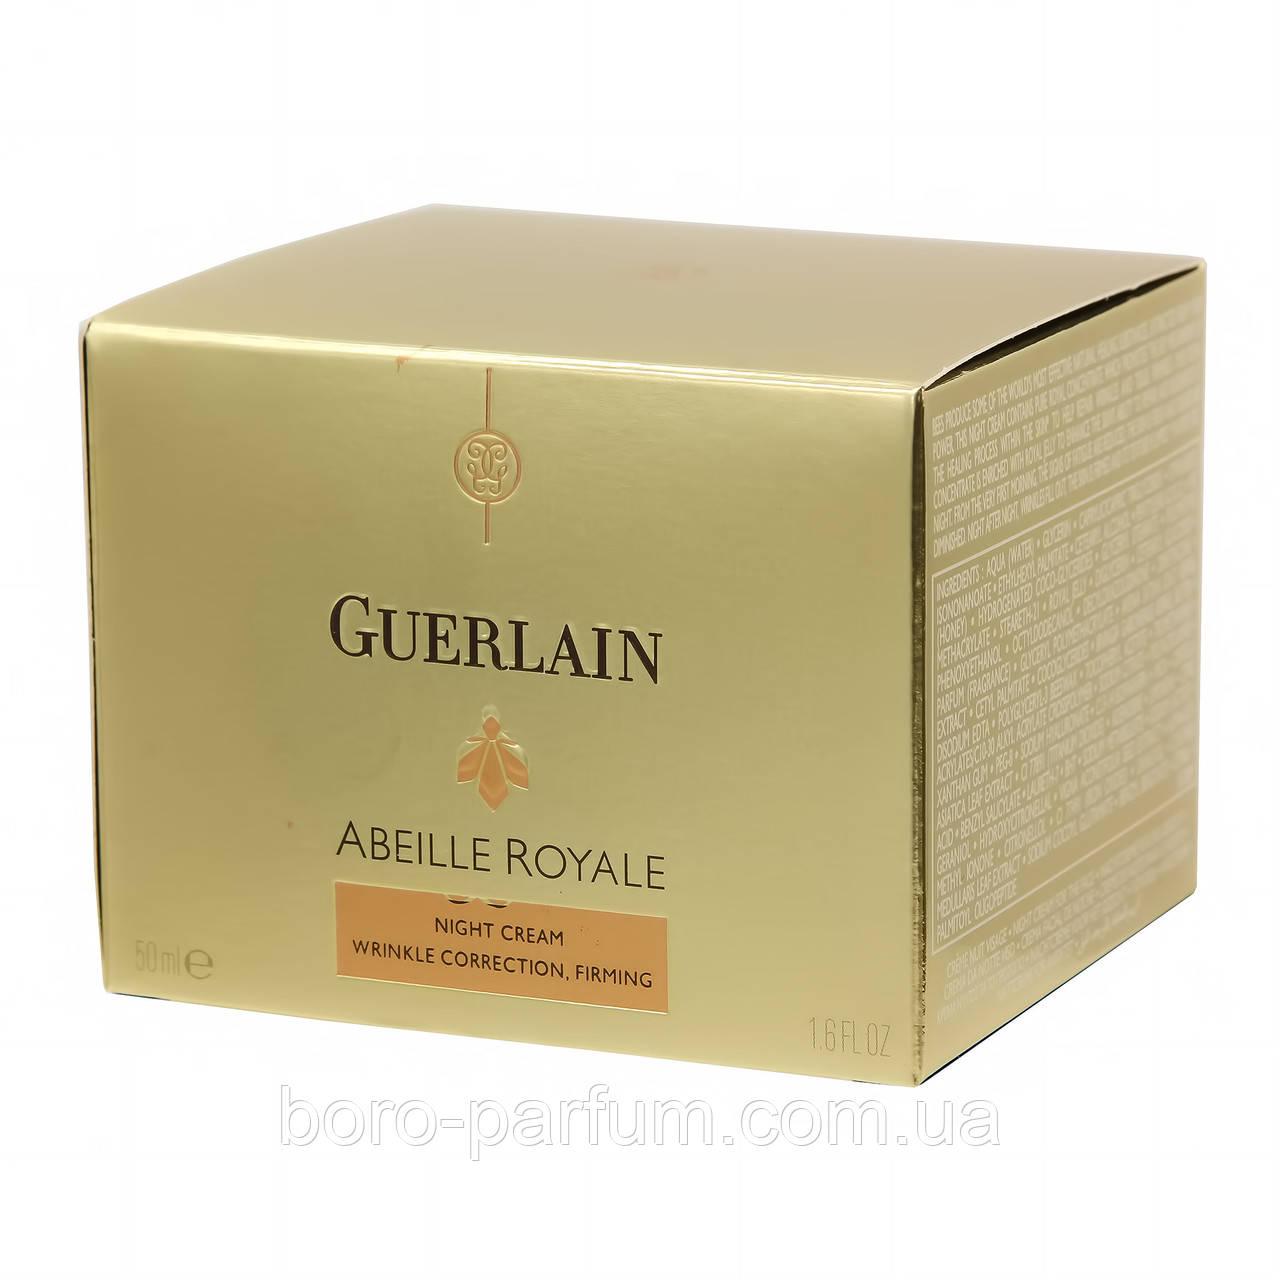 ночной крем Guerlain Abeille Royale Night Cream